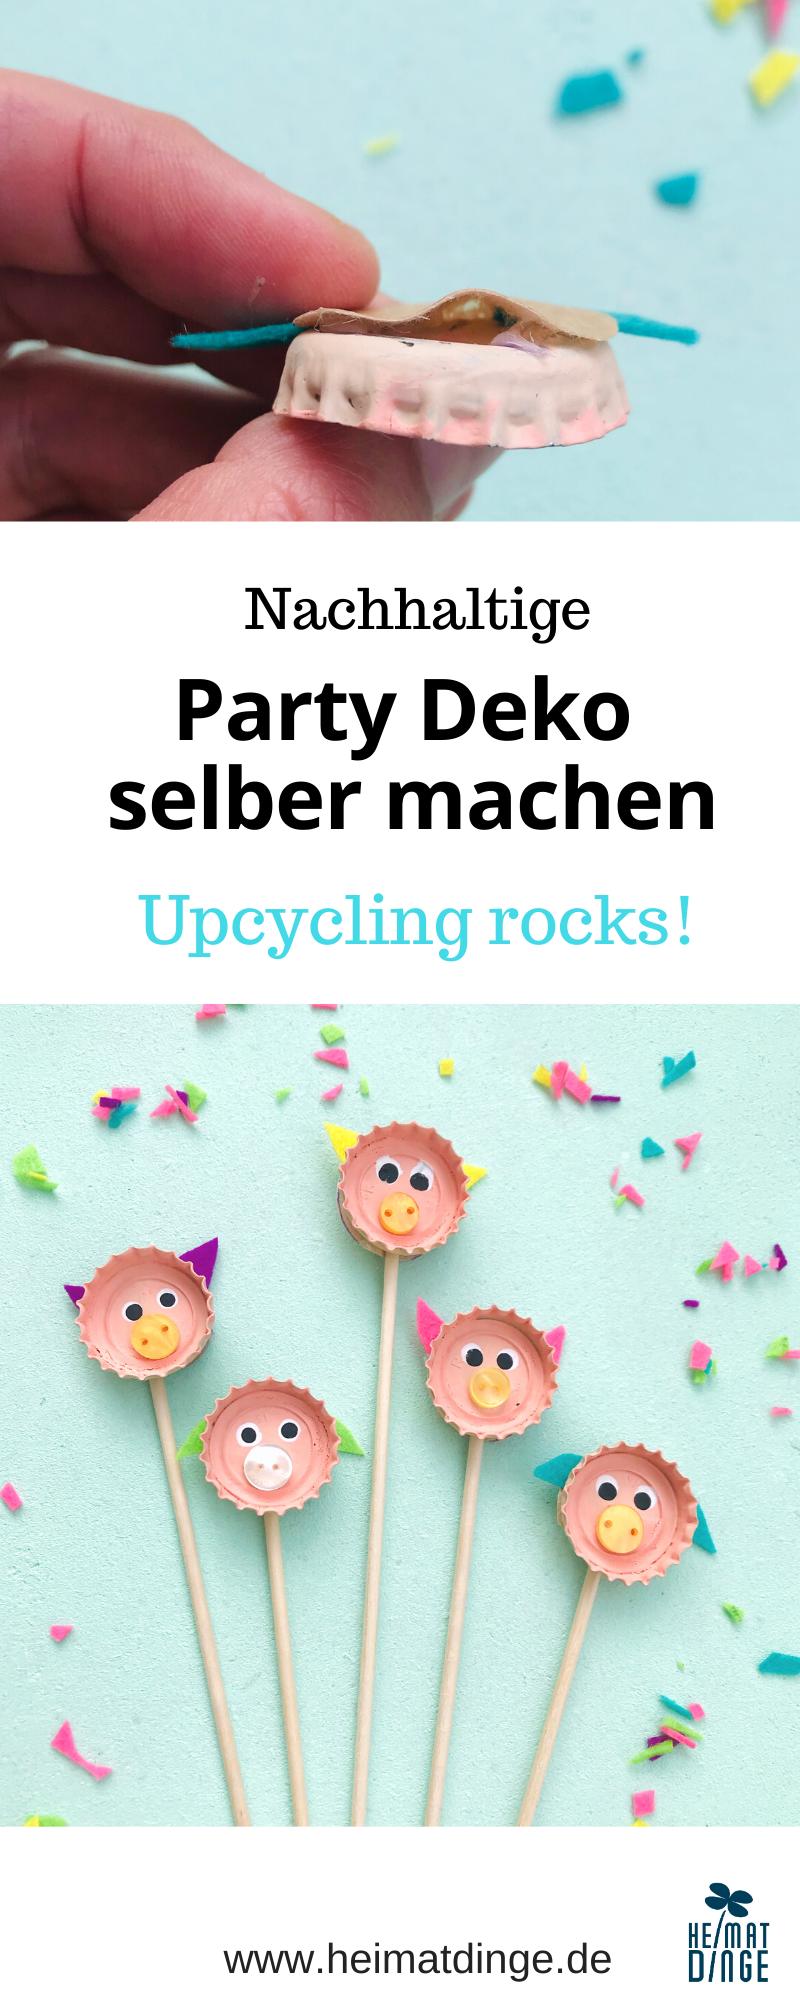 Party Deko selber machen, Upcycling Bastelidee fuer Kinder, Party Picker DIY